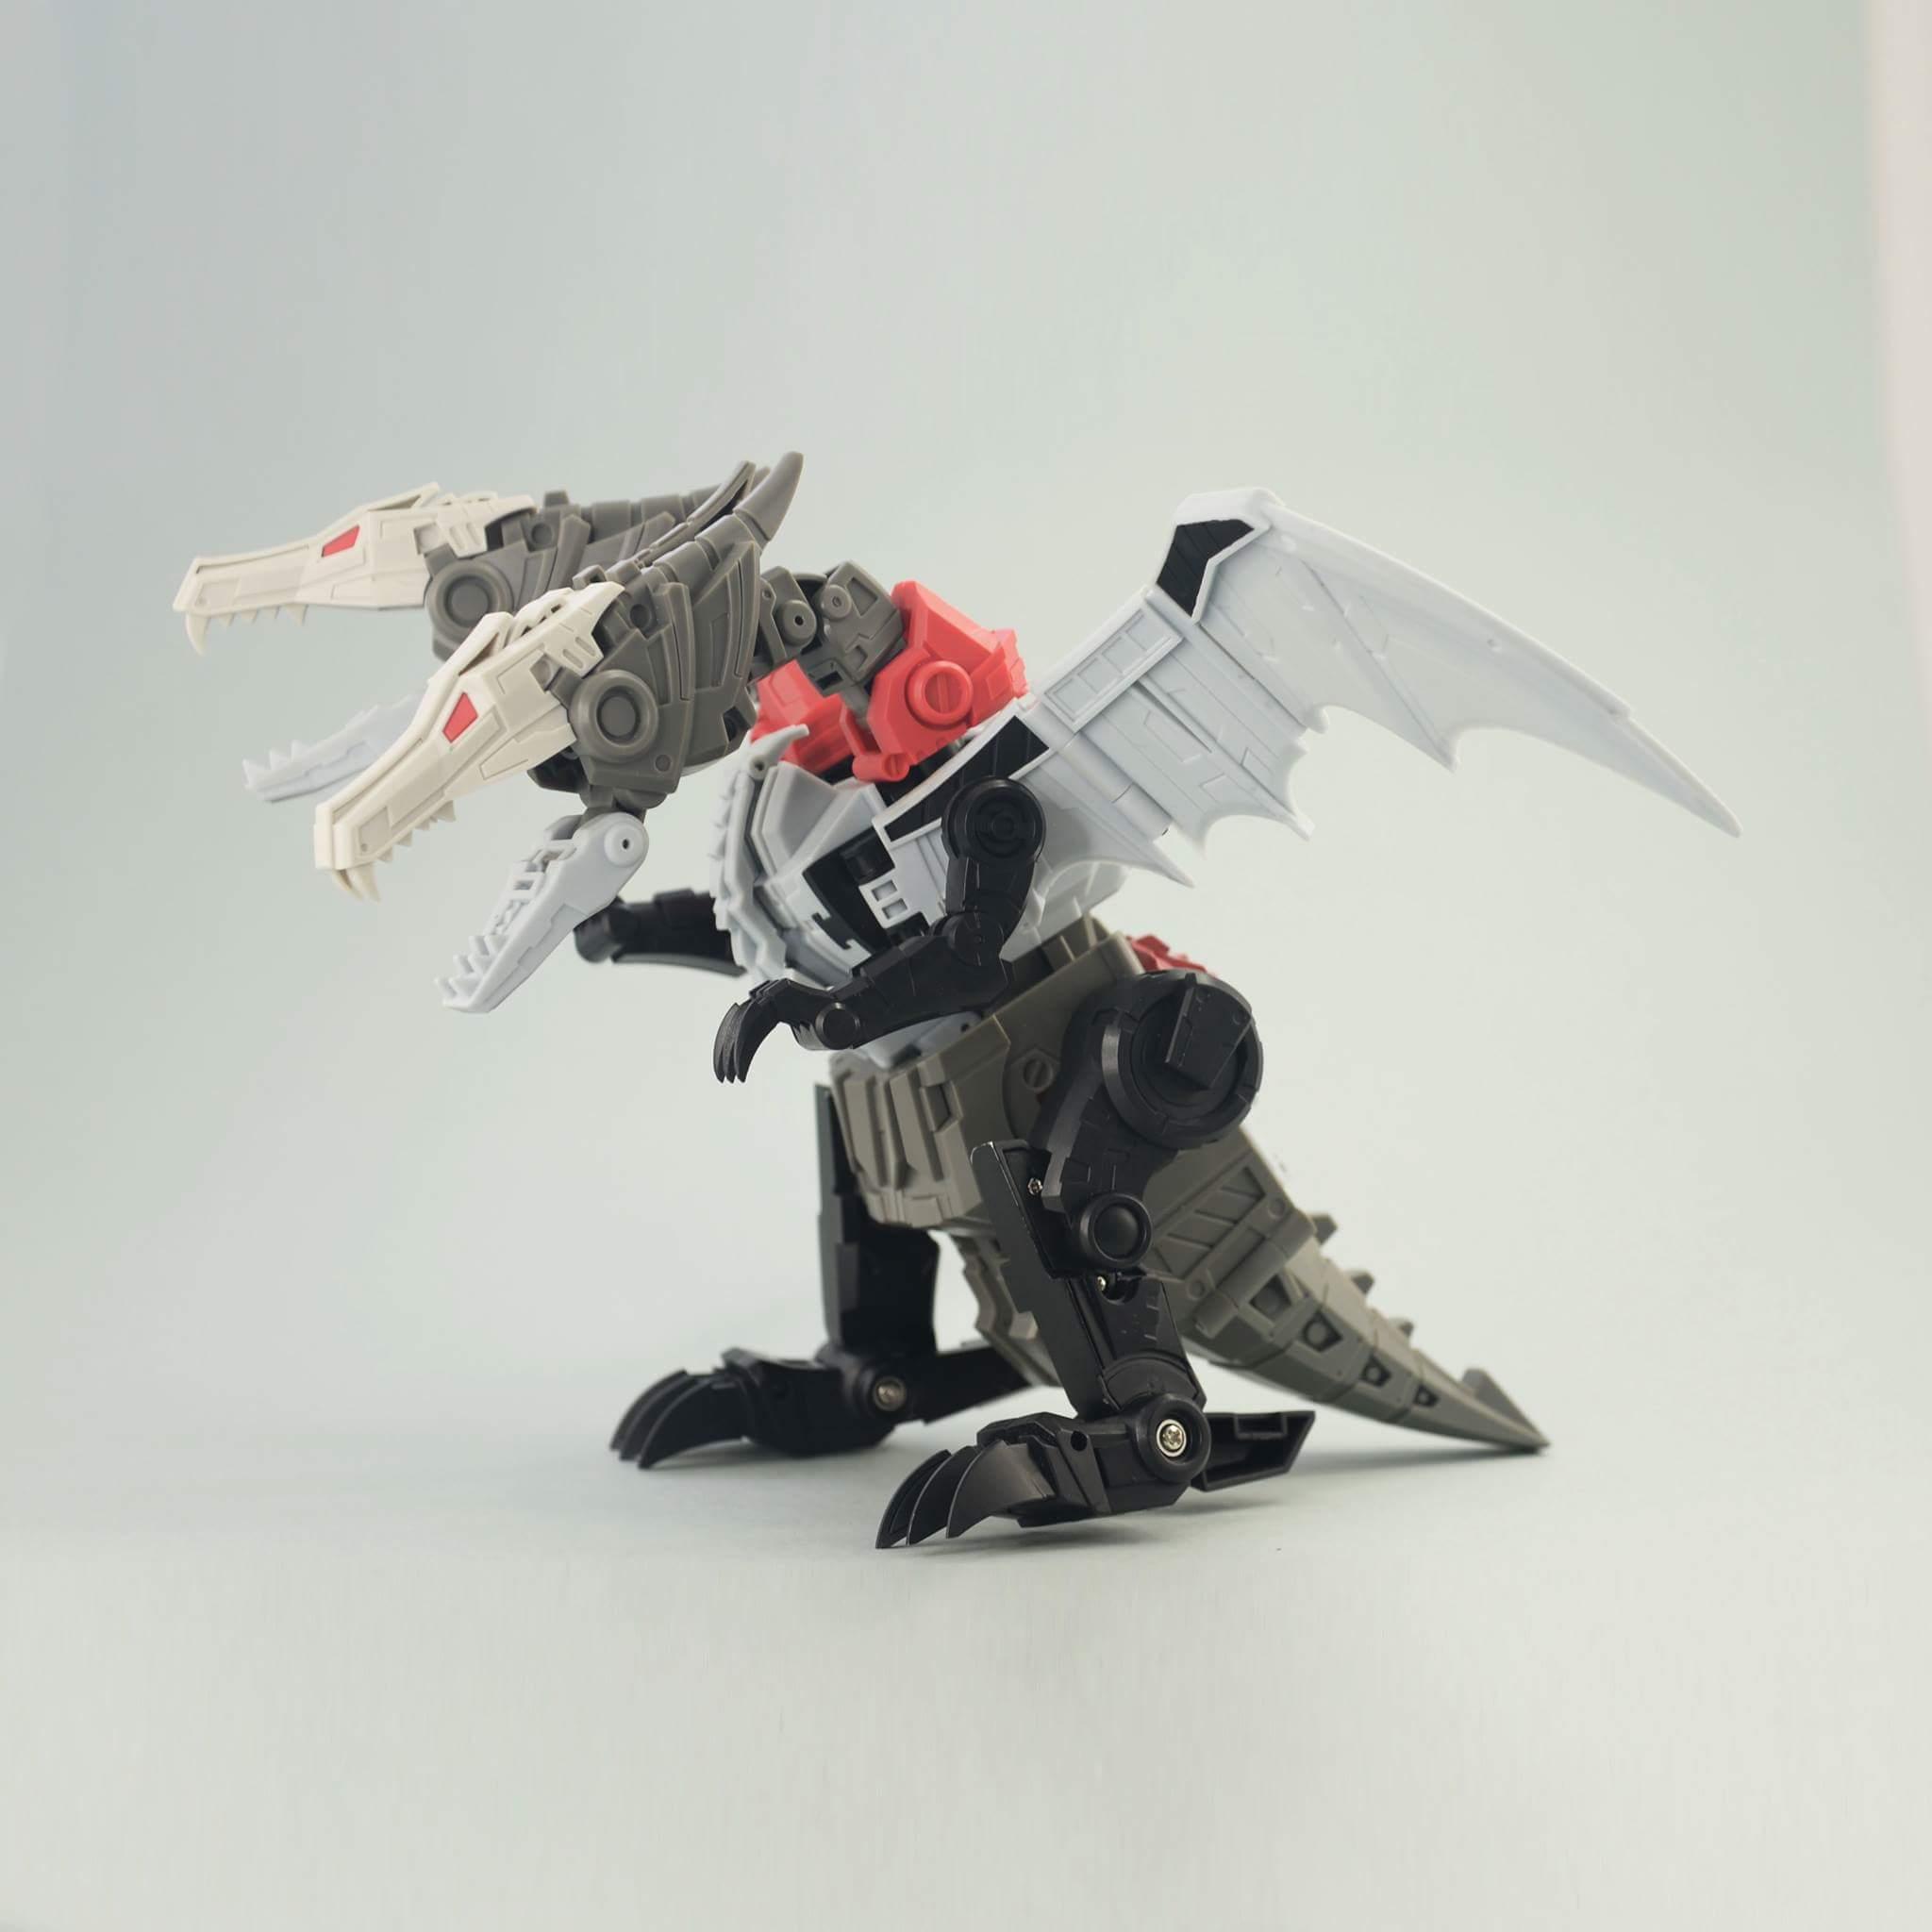 [FansHobby] Produit Tiers - Master Builder MB-02/03/05 - aka Monsterbots/Monstrebots - Page 2 JplJpdsI